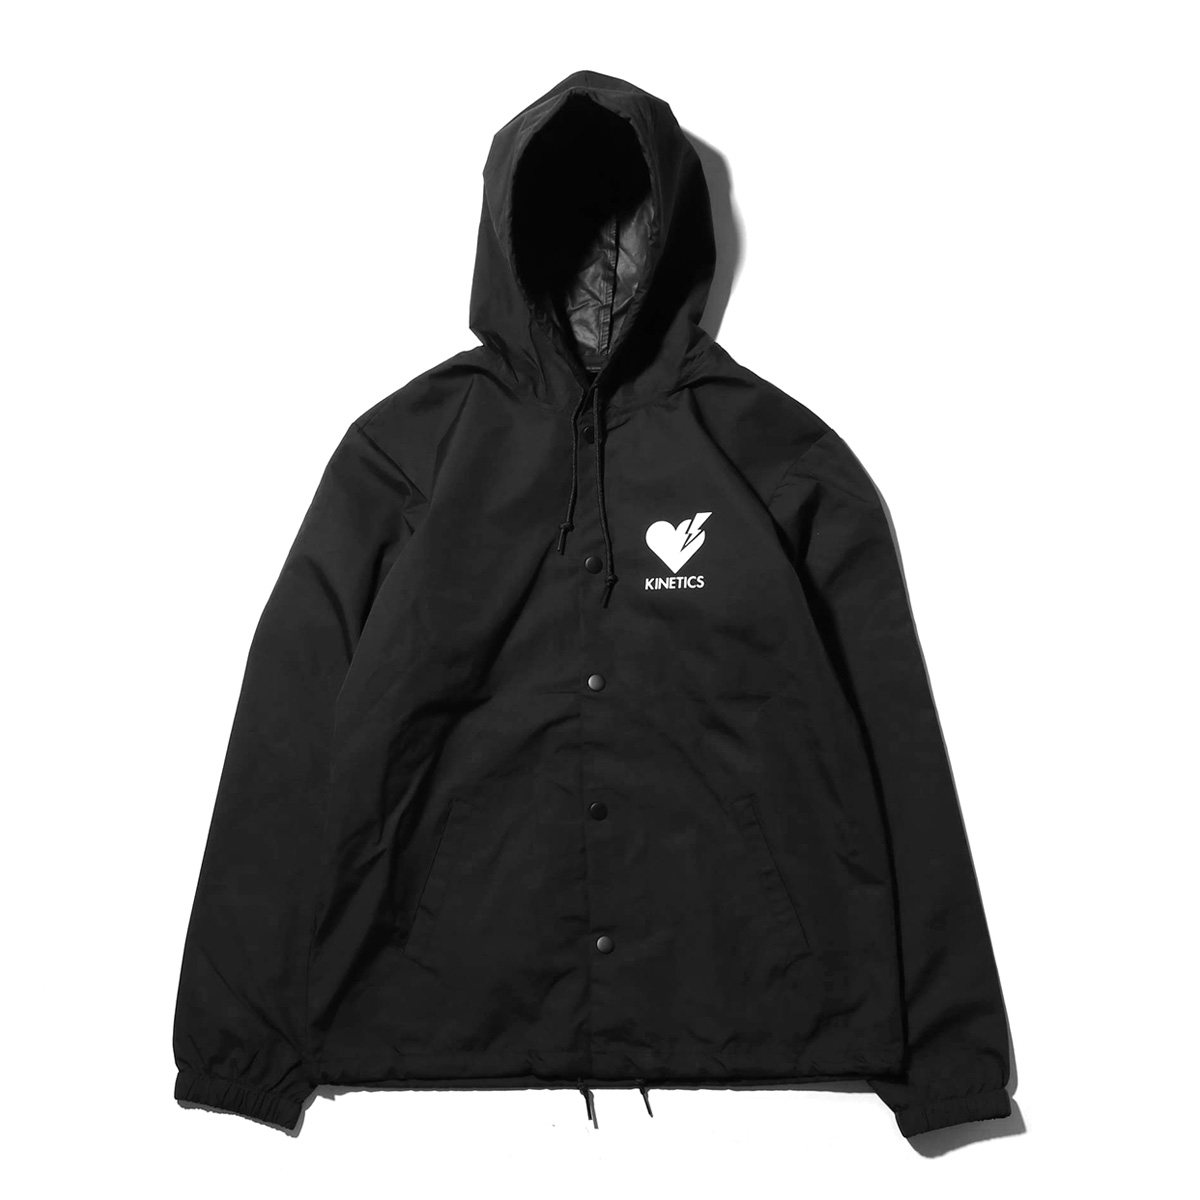 Kinetics Patient Hooded Jacket(キネティクス ペイシャント フーデッド ジャケット)(BLACK)【メンズ】【ジャケット】【19SS-I】